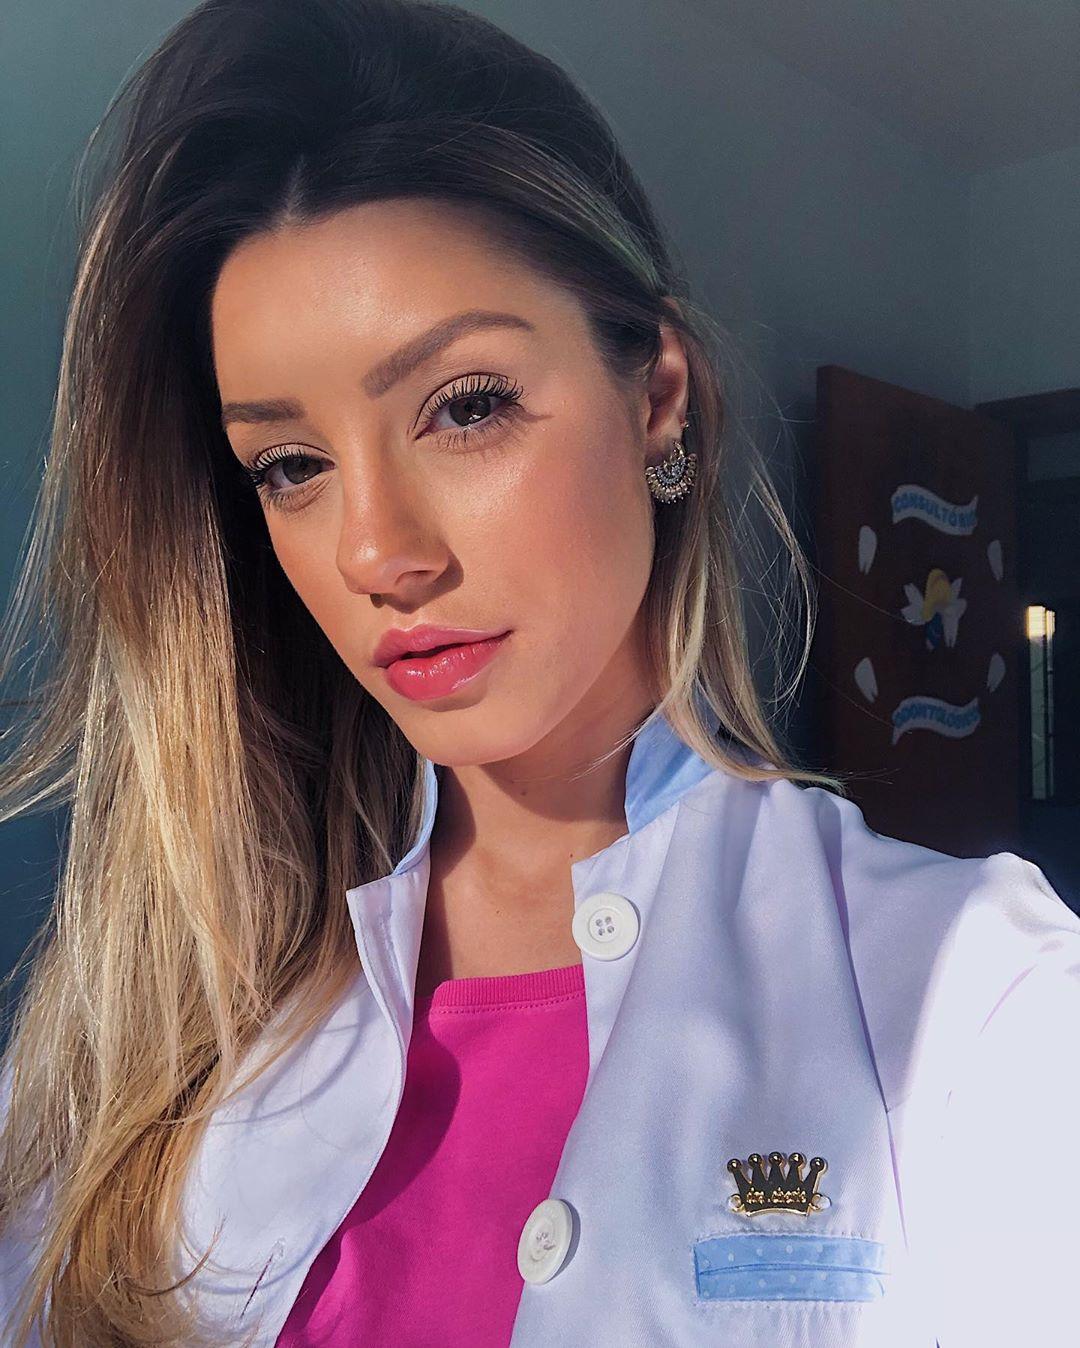 isabela stella, candidata a miss parana 2020, miss arapongas 2017/2019. 90430510